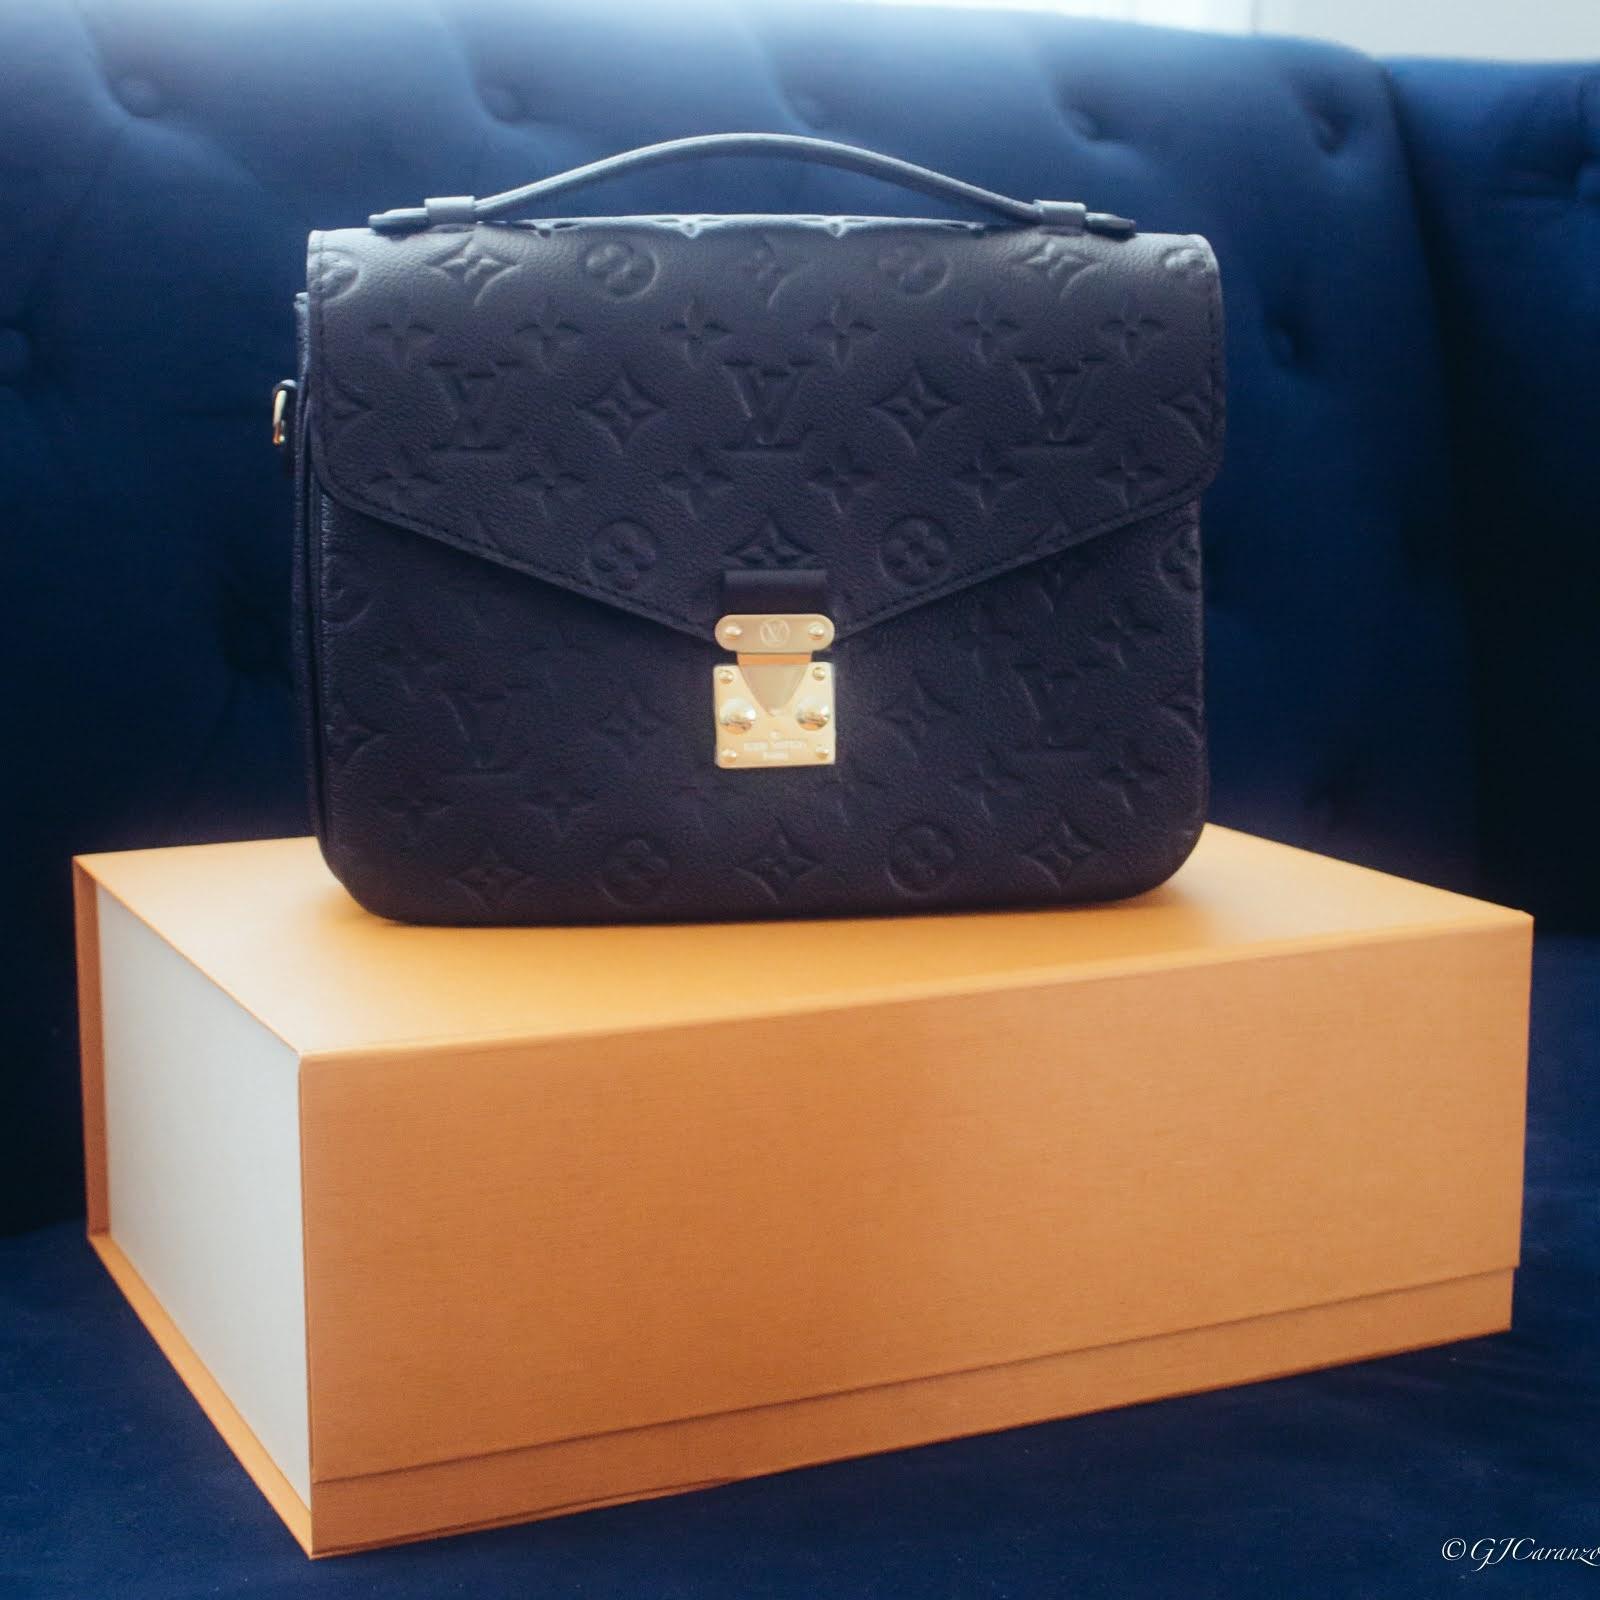 Unboxing Louis Vuitton Pochette Metis in Black Empreinte Leather